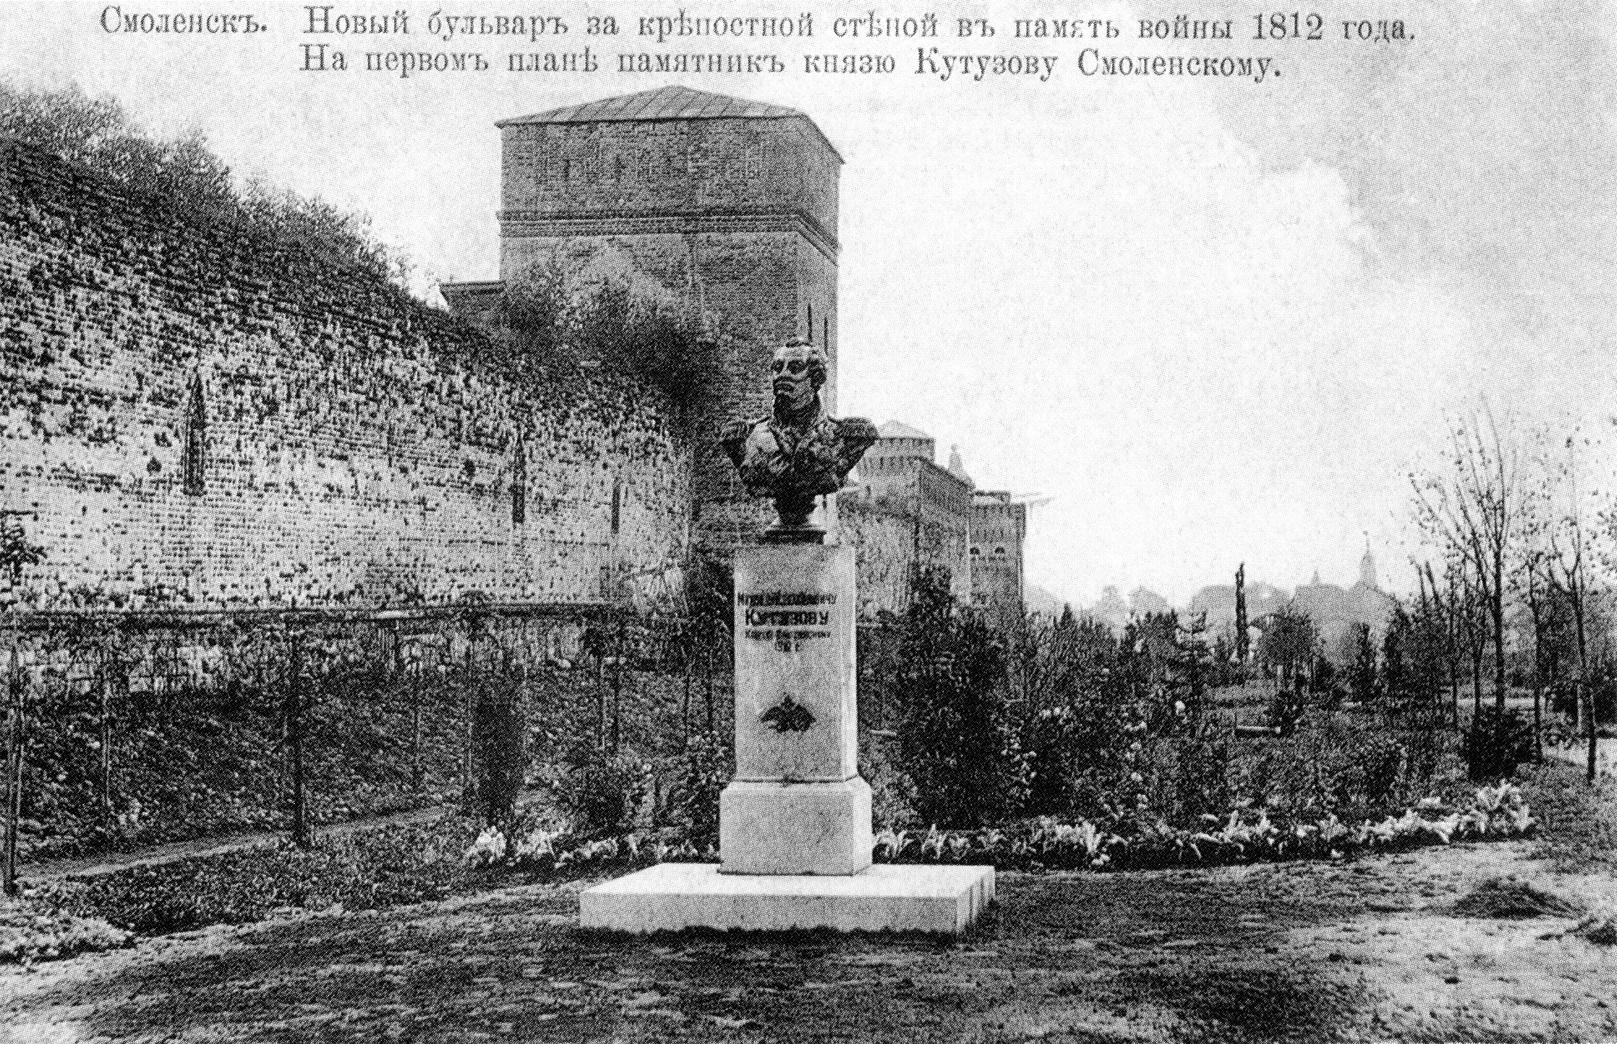 Бюст М.И. Кутузова на Бульваре памяти 1812 года